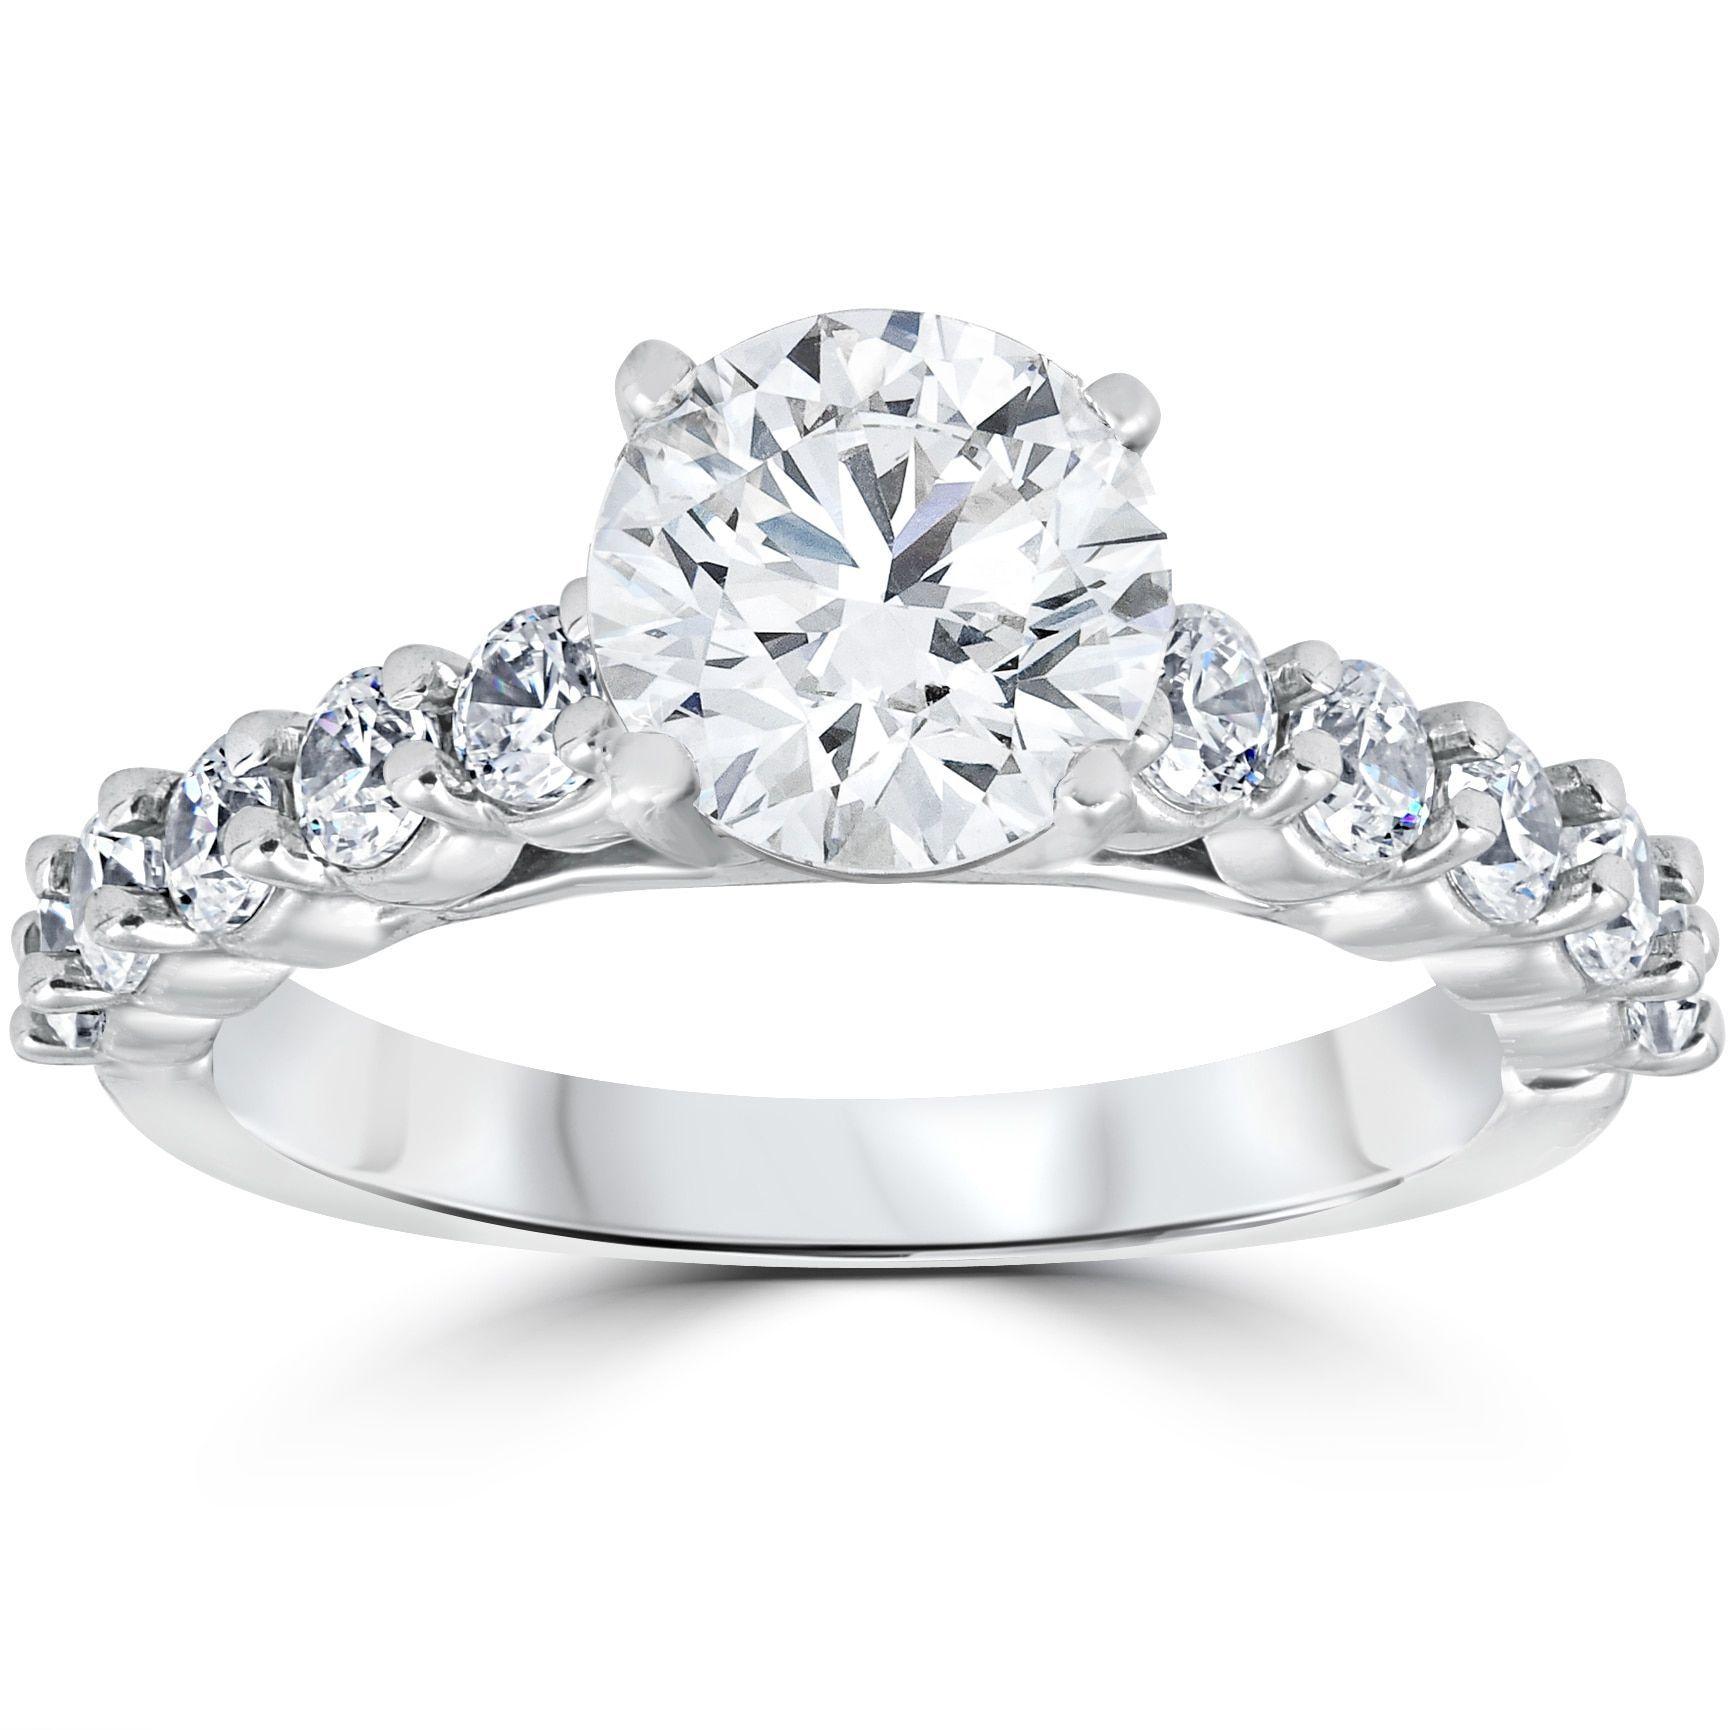 bliss 14k white gold 2ct tdw diamond clarity enhanced engagement